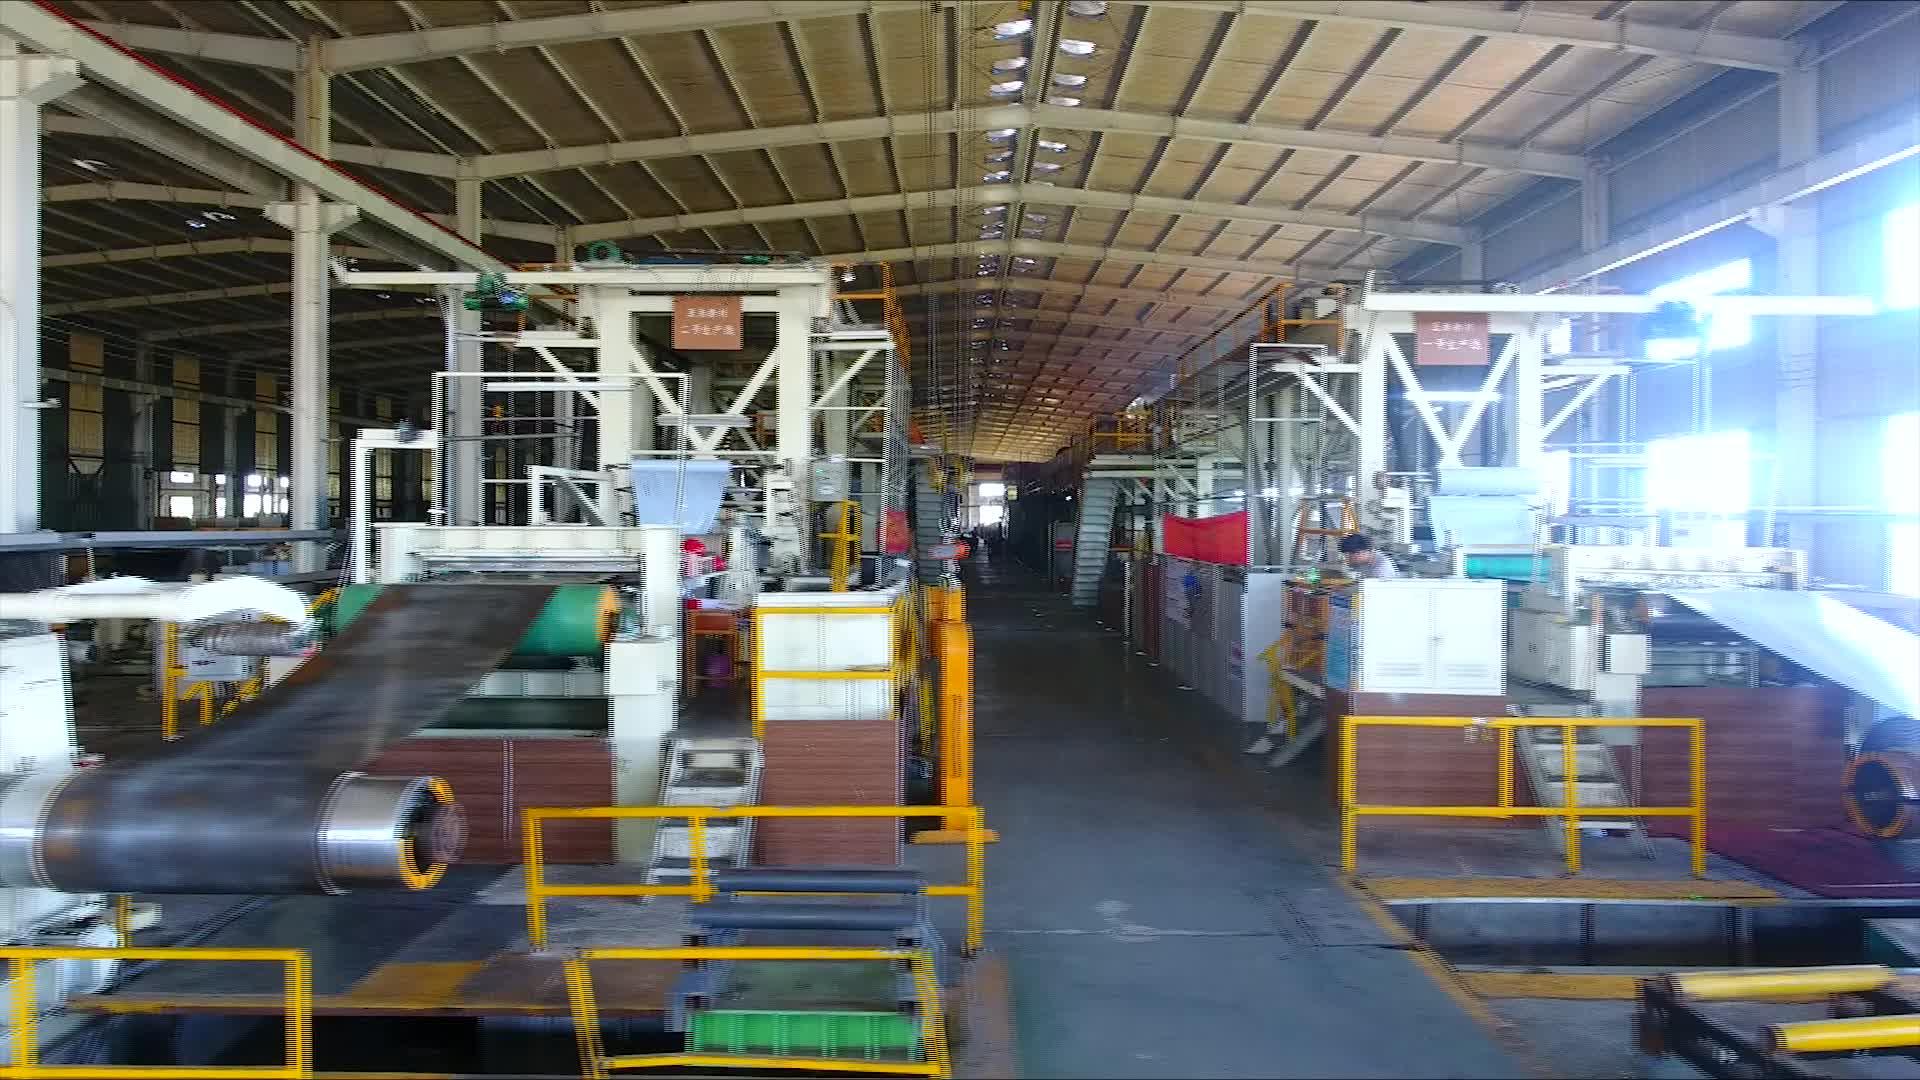 Prepainted aluminum suppliers 5005 5052 color coated aluminum sheet /plate